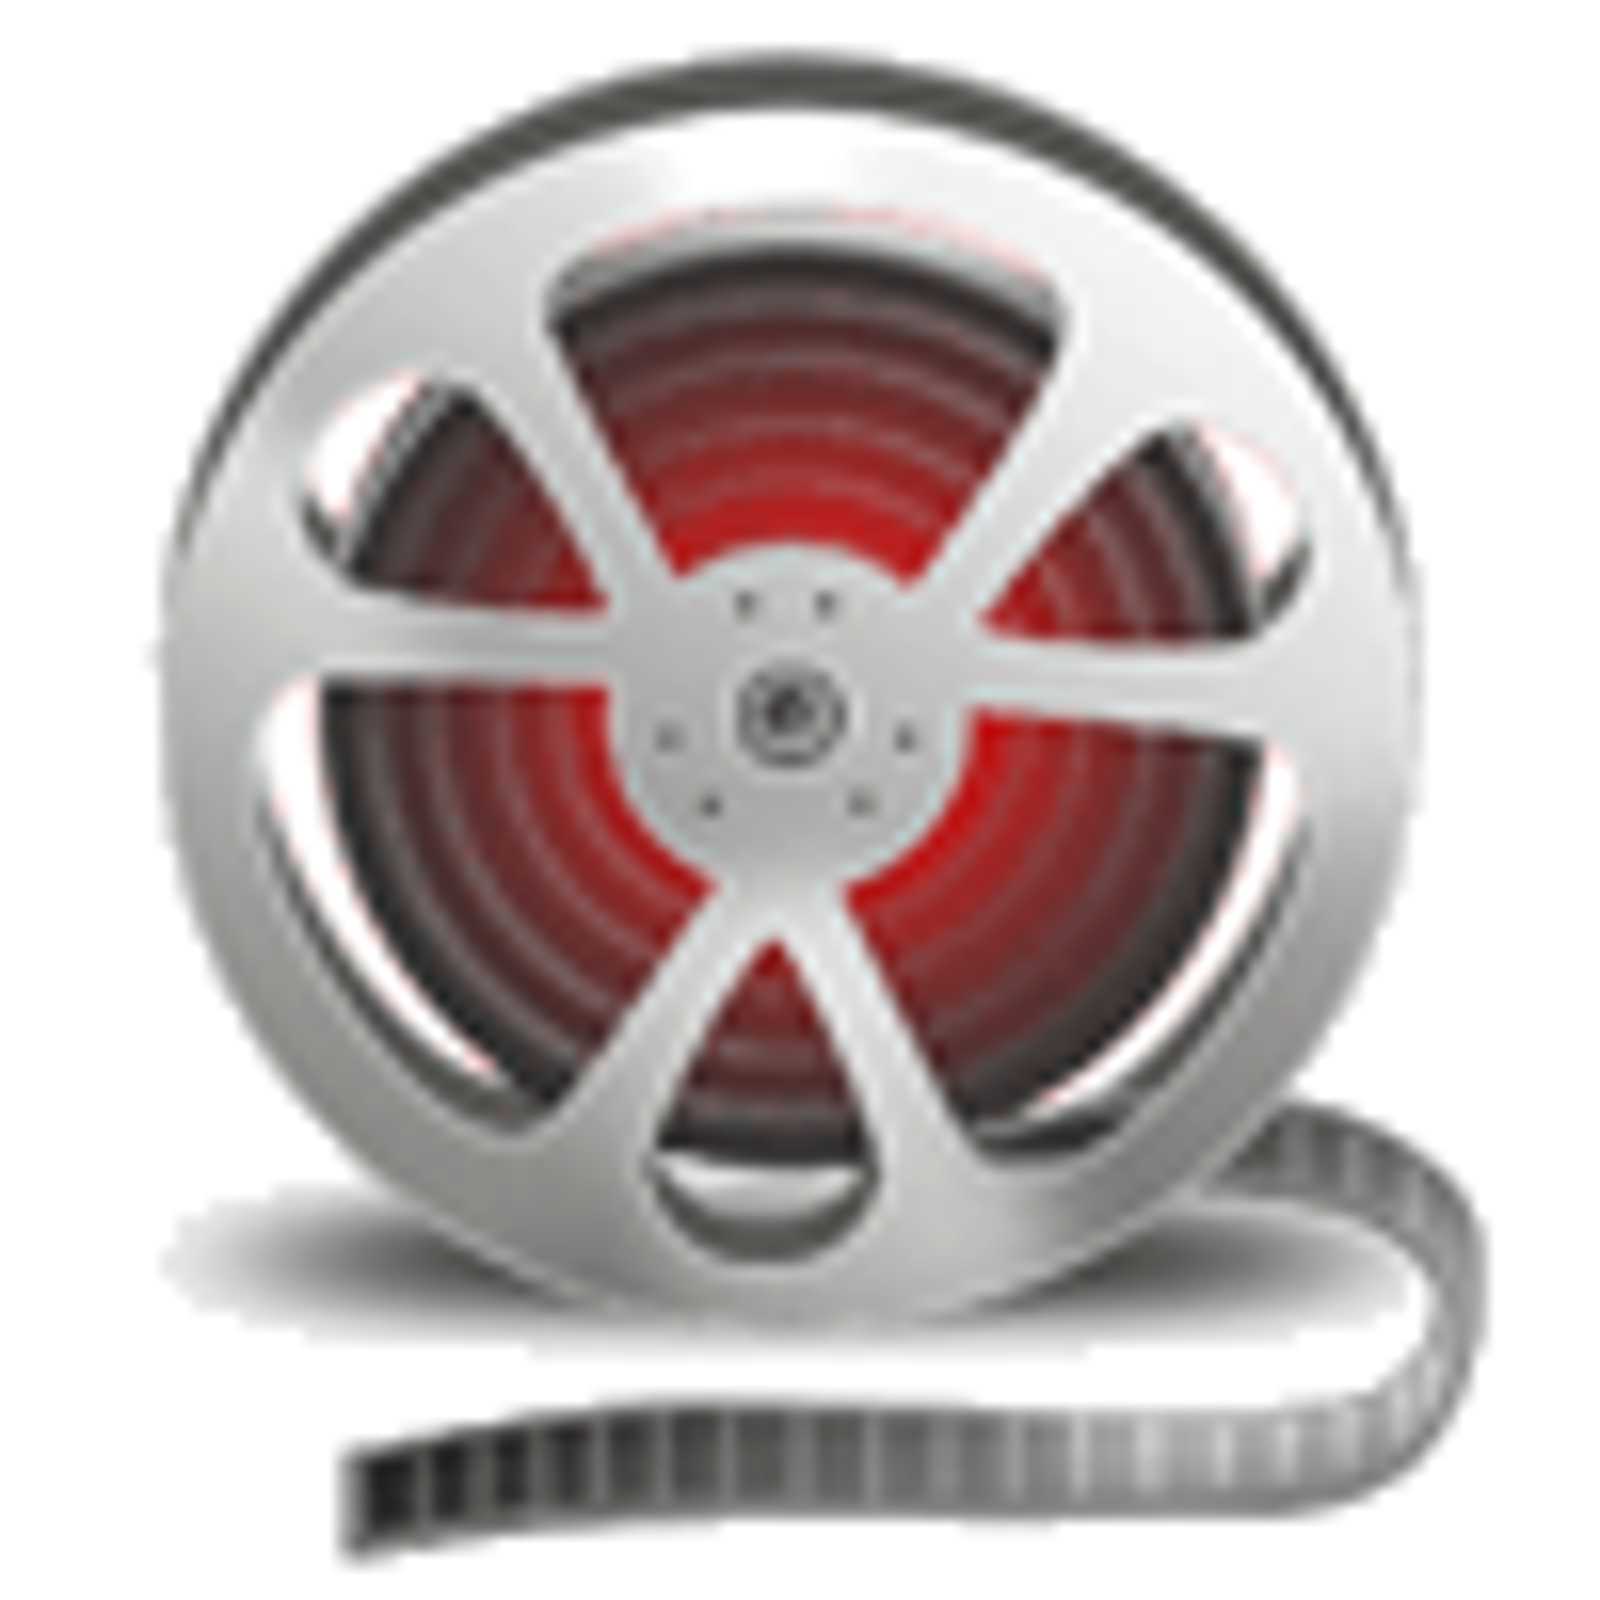 ImTOO 3GP Video Converter 5.1.21.0220